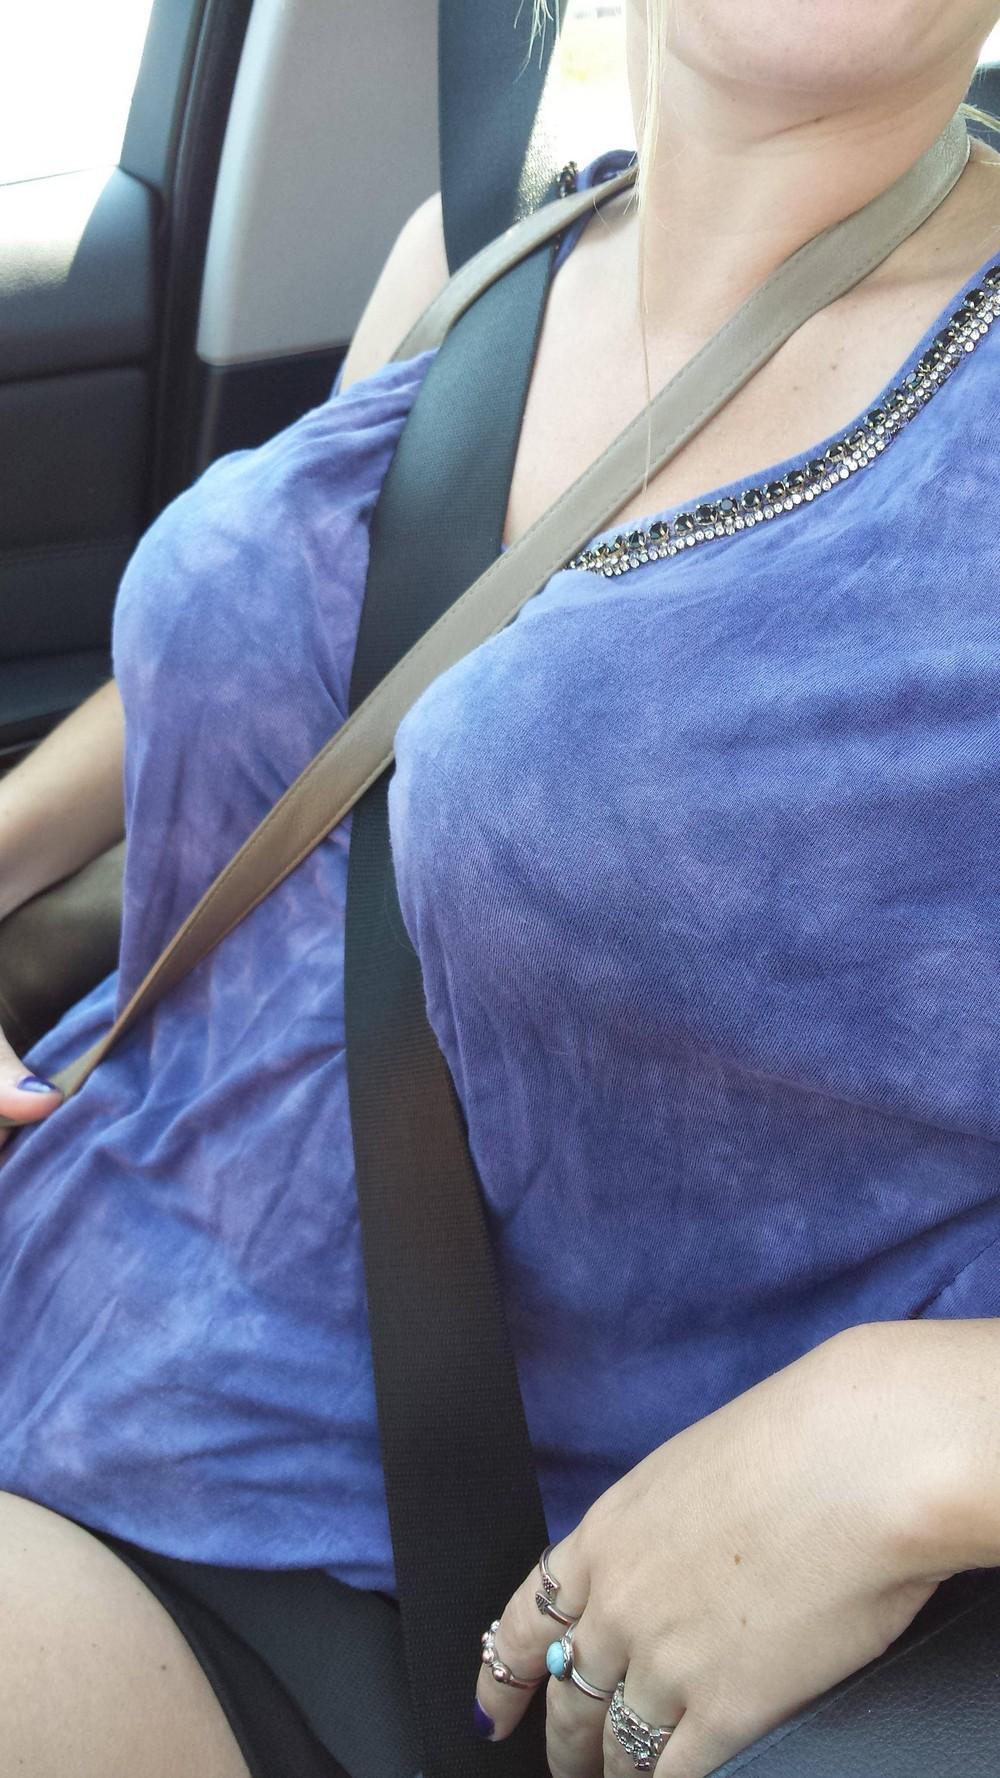 Красивые девушки и ремни через плечо #strapboobs